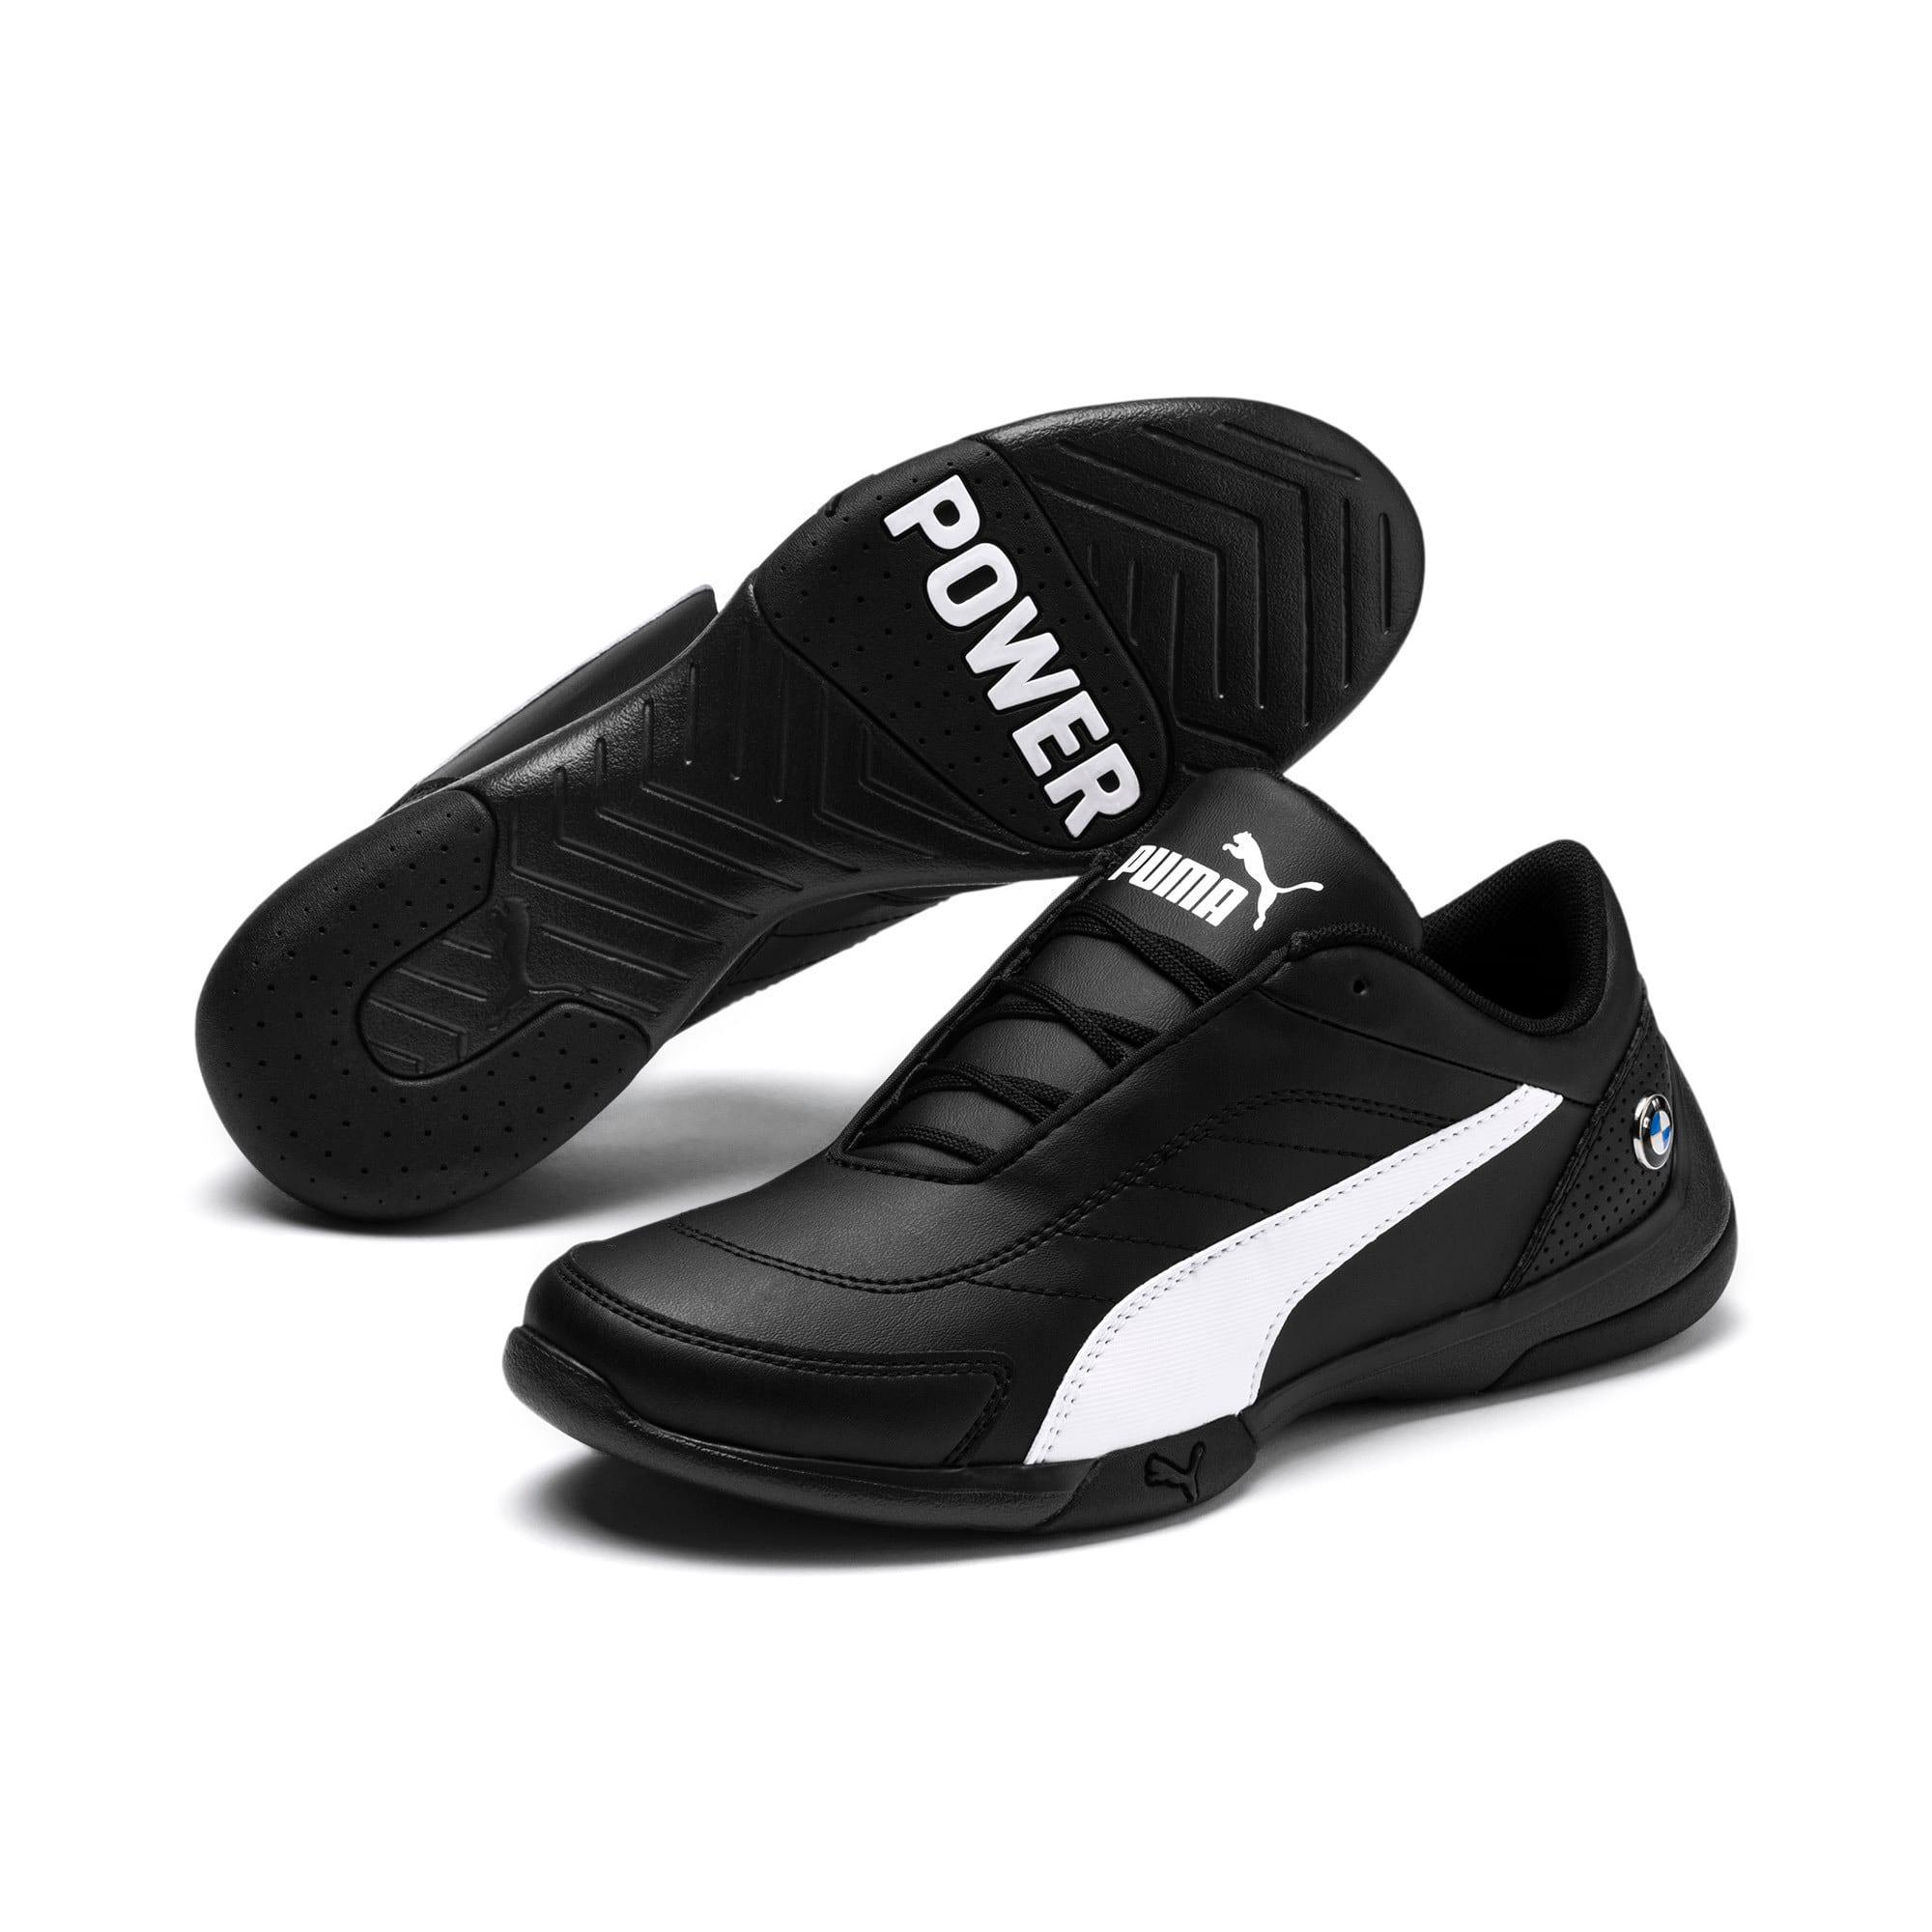 Thumbnail 2 of BMW MMS Kart Cat III Shoes JR, Puma Black-Puma White, medium